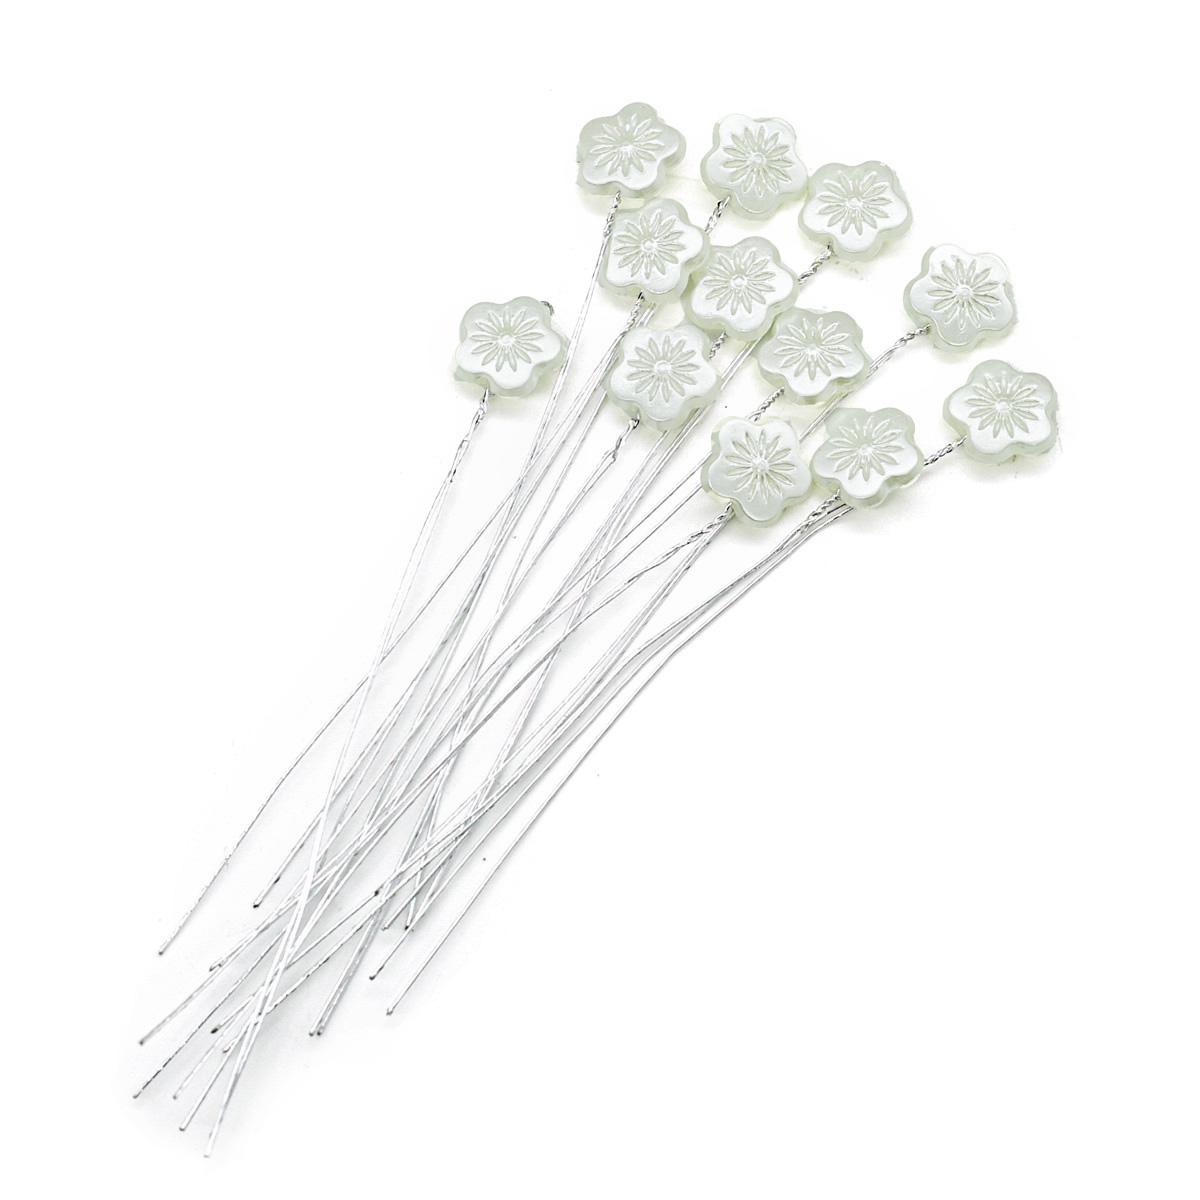 MH9-2260 Декоративный элемент на проволоке Цветок 1,4*1,4см, длина 11см,12шт, Астра